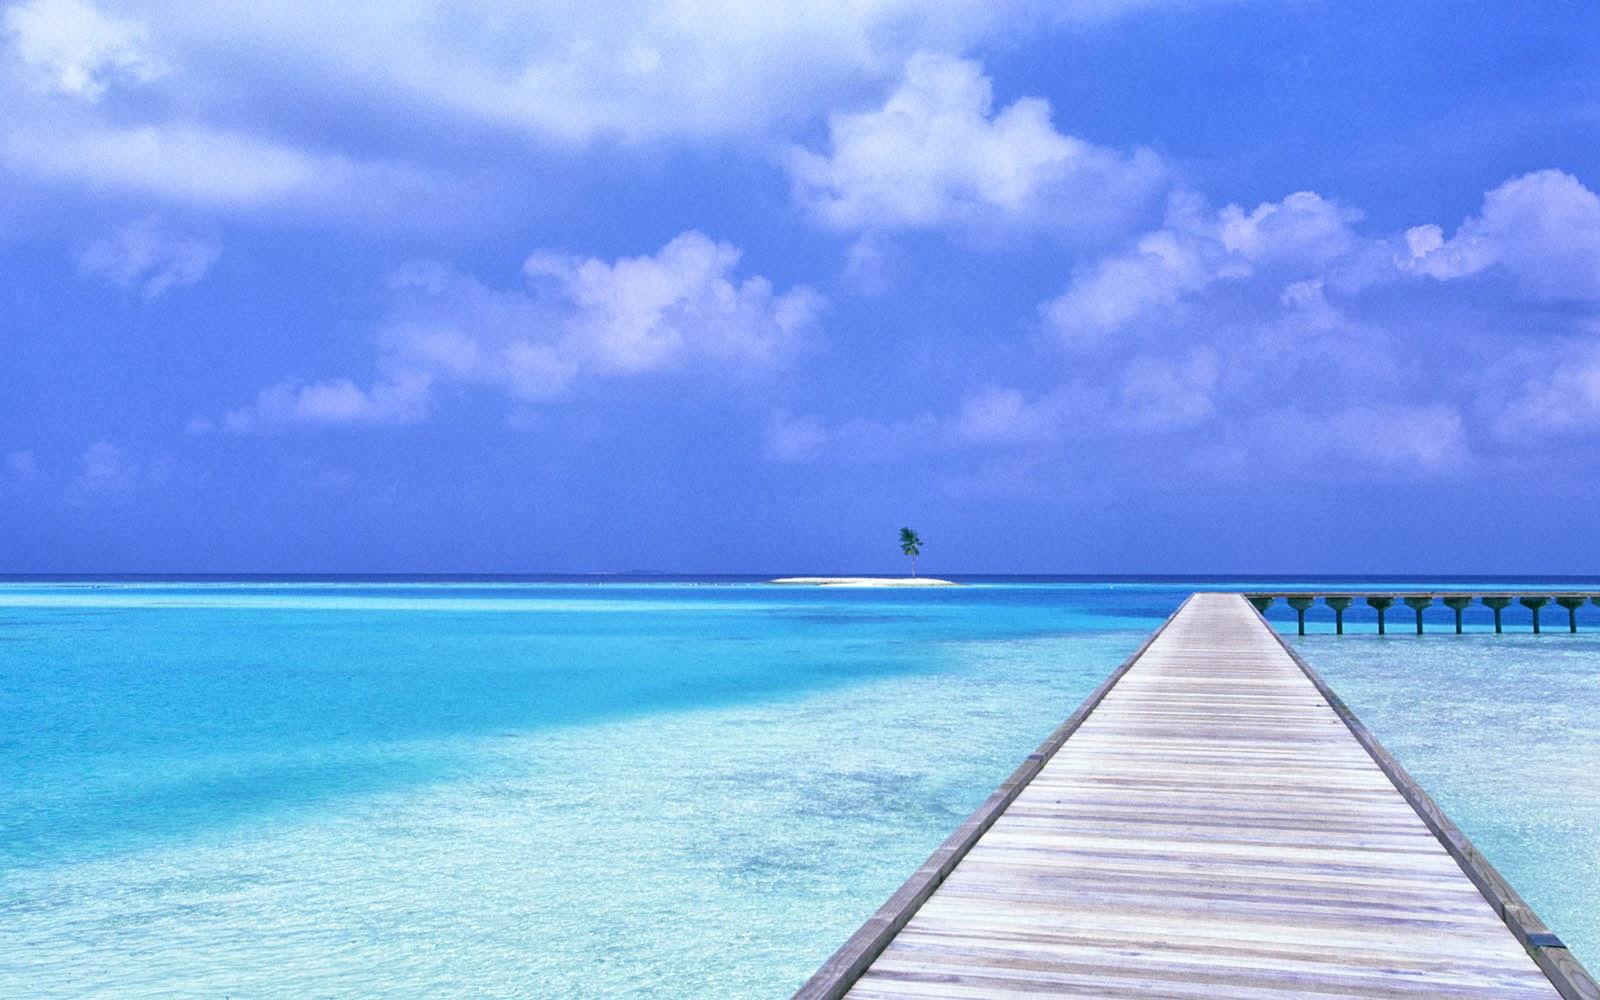 apple wallpaper hd maldives - photo #10